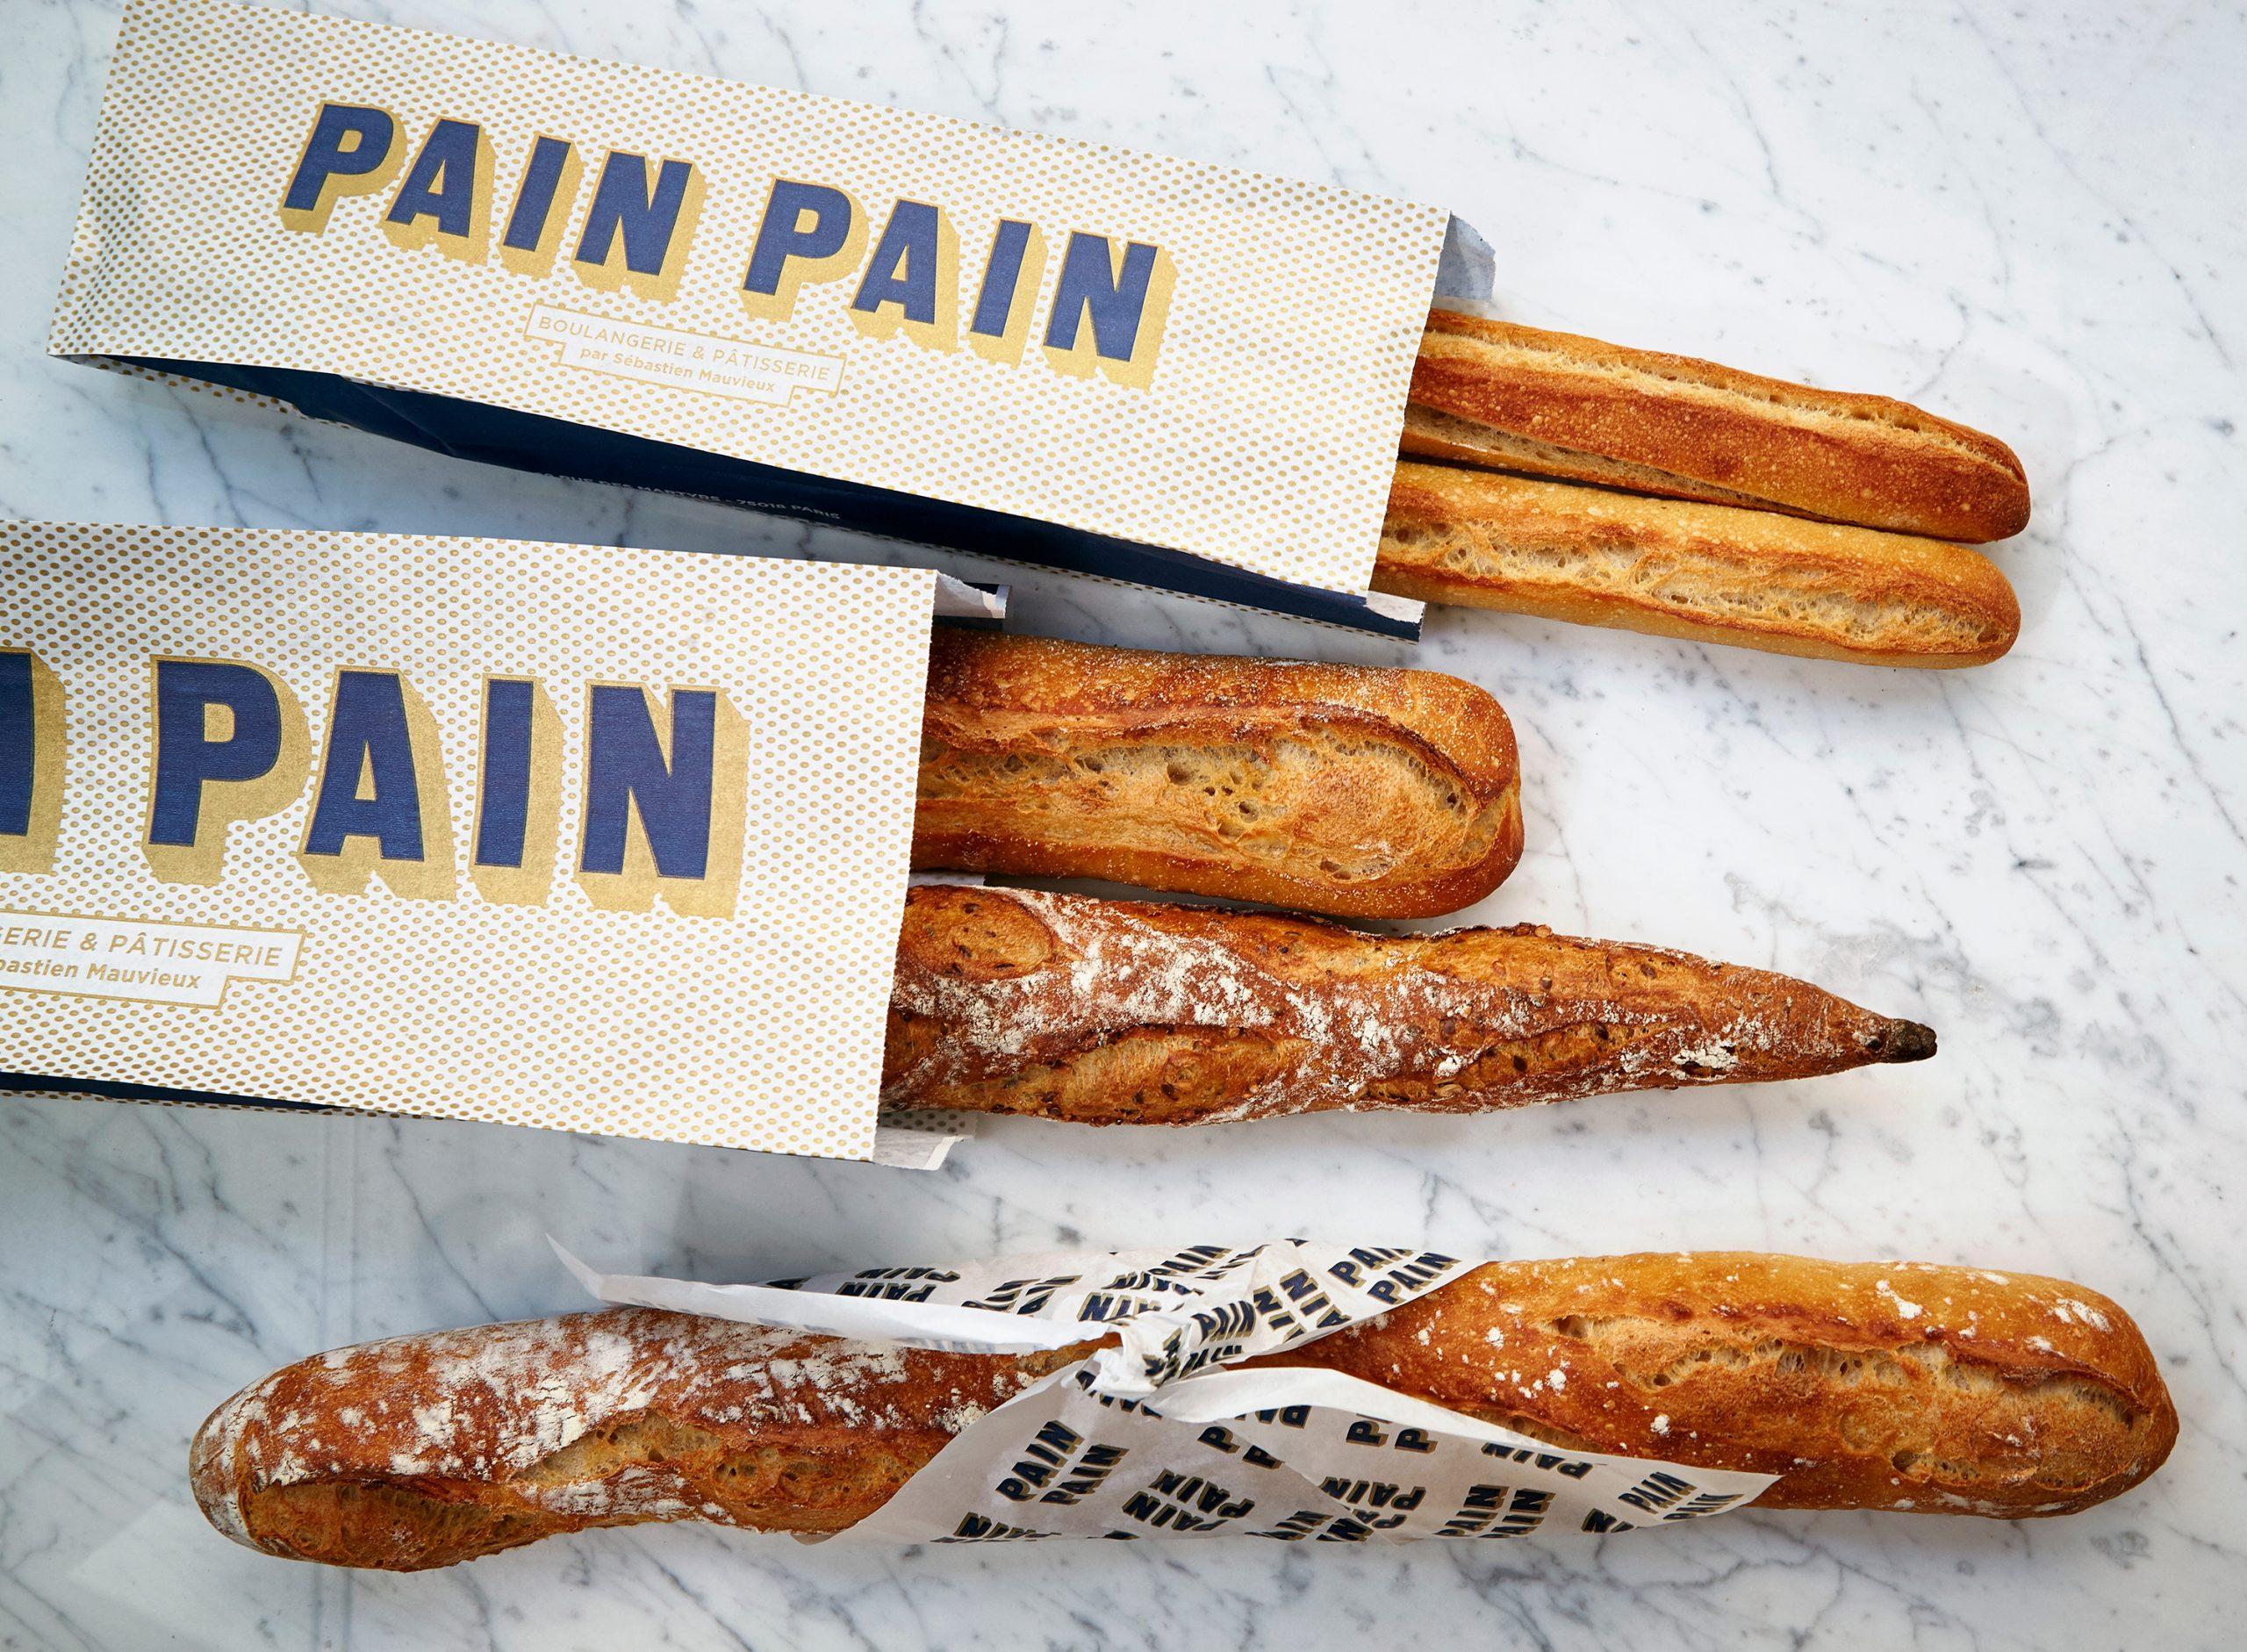 Baguette PAINPAIN LAPETITEGROSSE